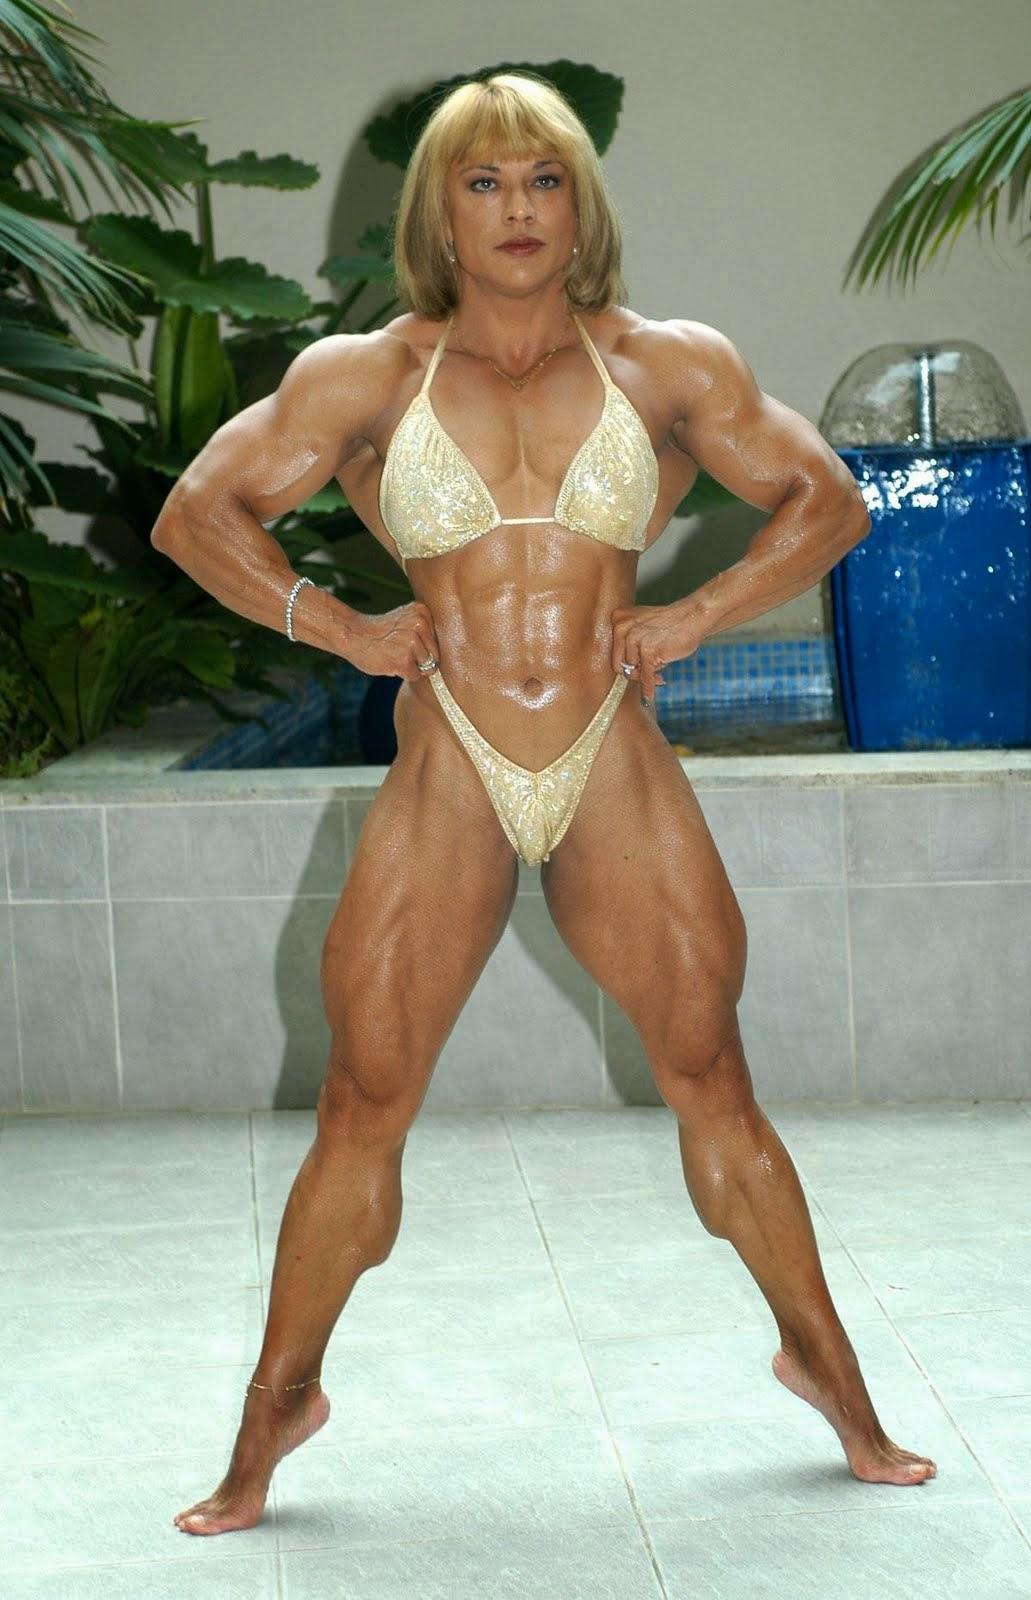 Female Bodybuilding - Juliette Bergmann